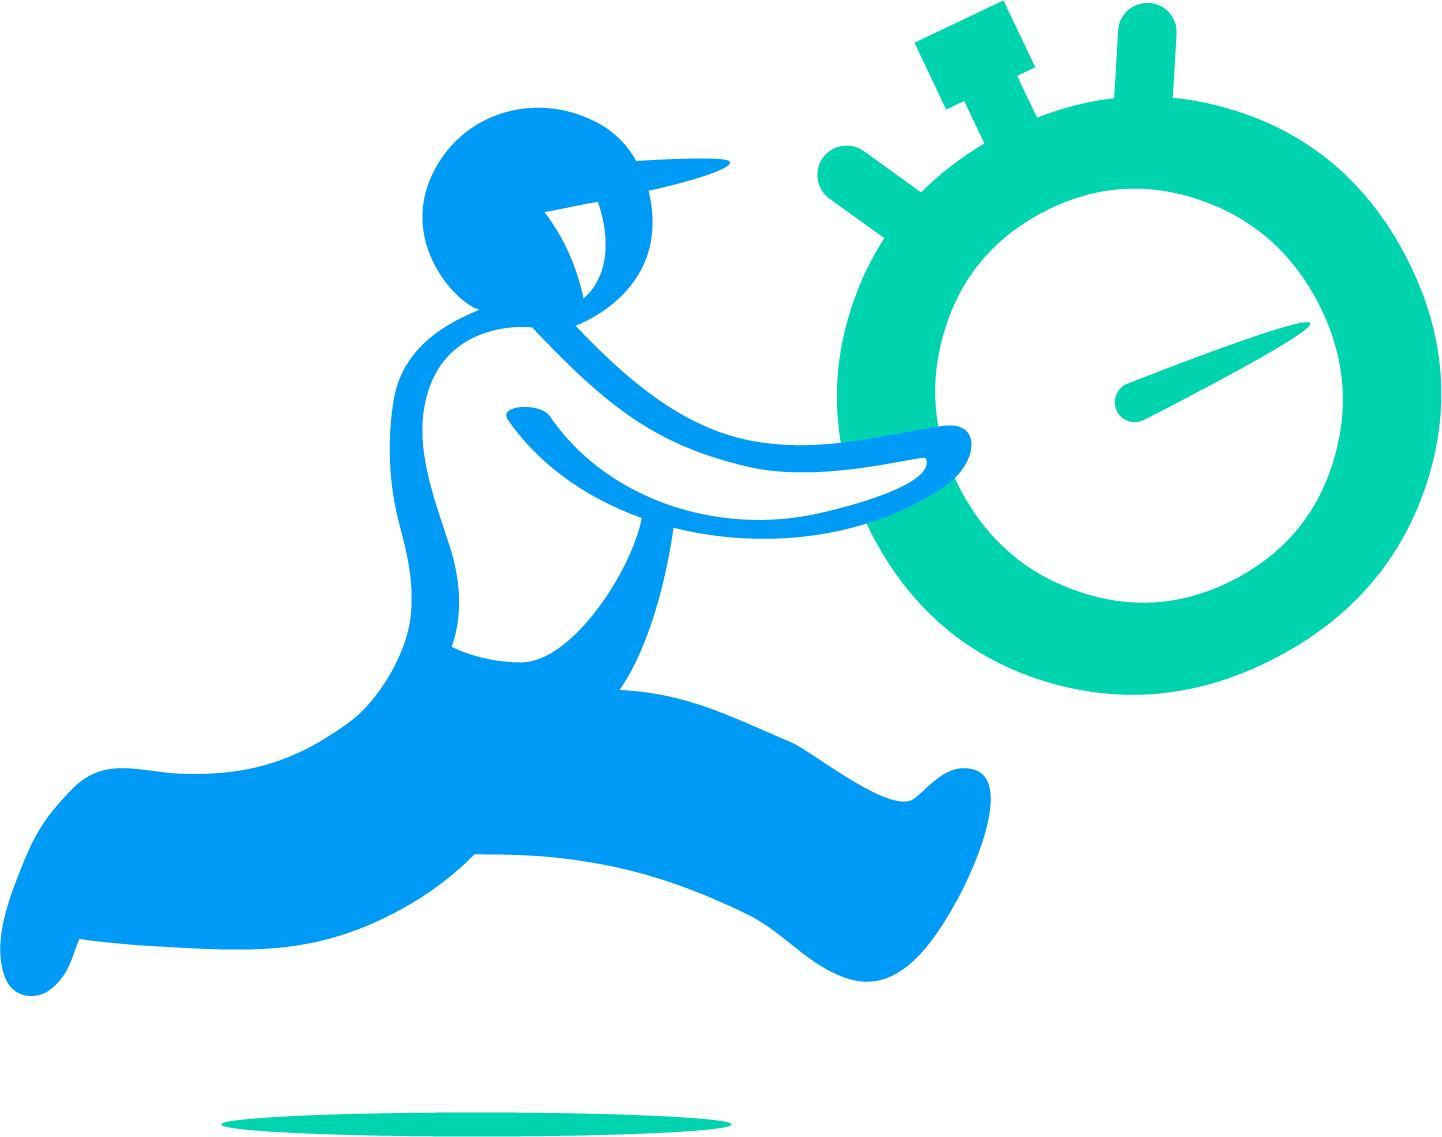 logo-green.png.jpeg